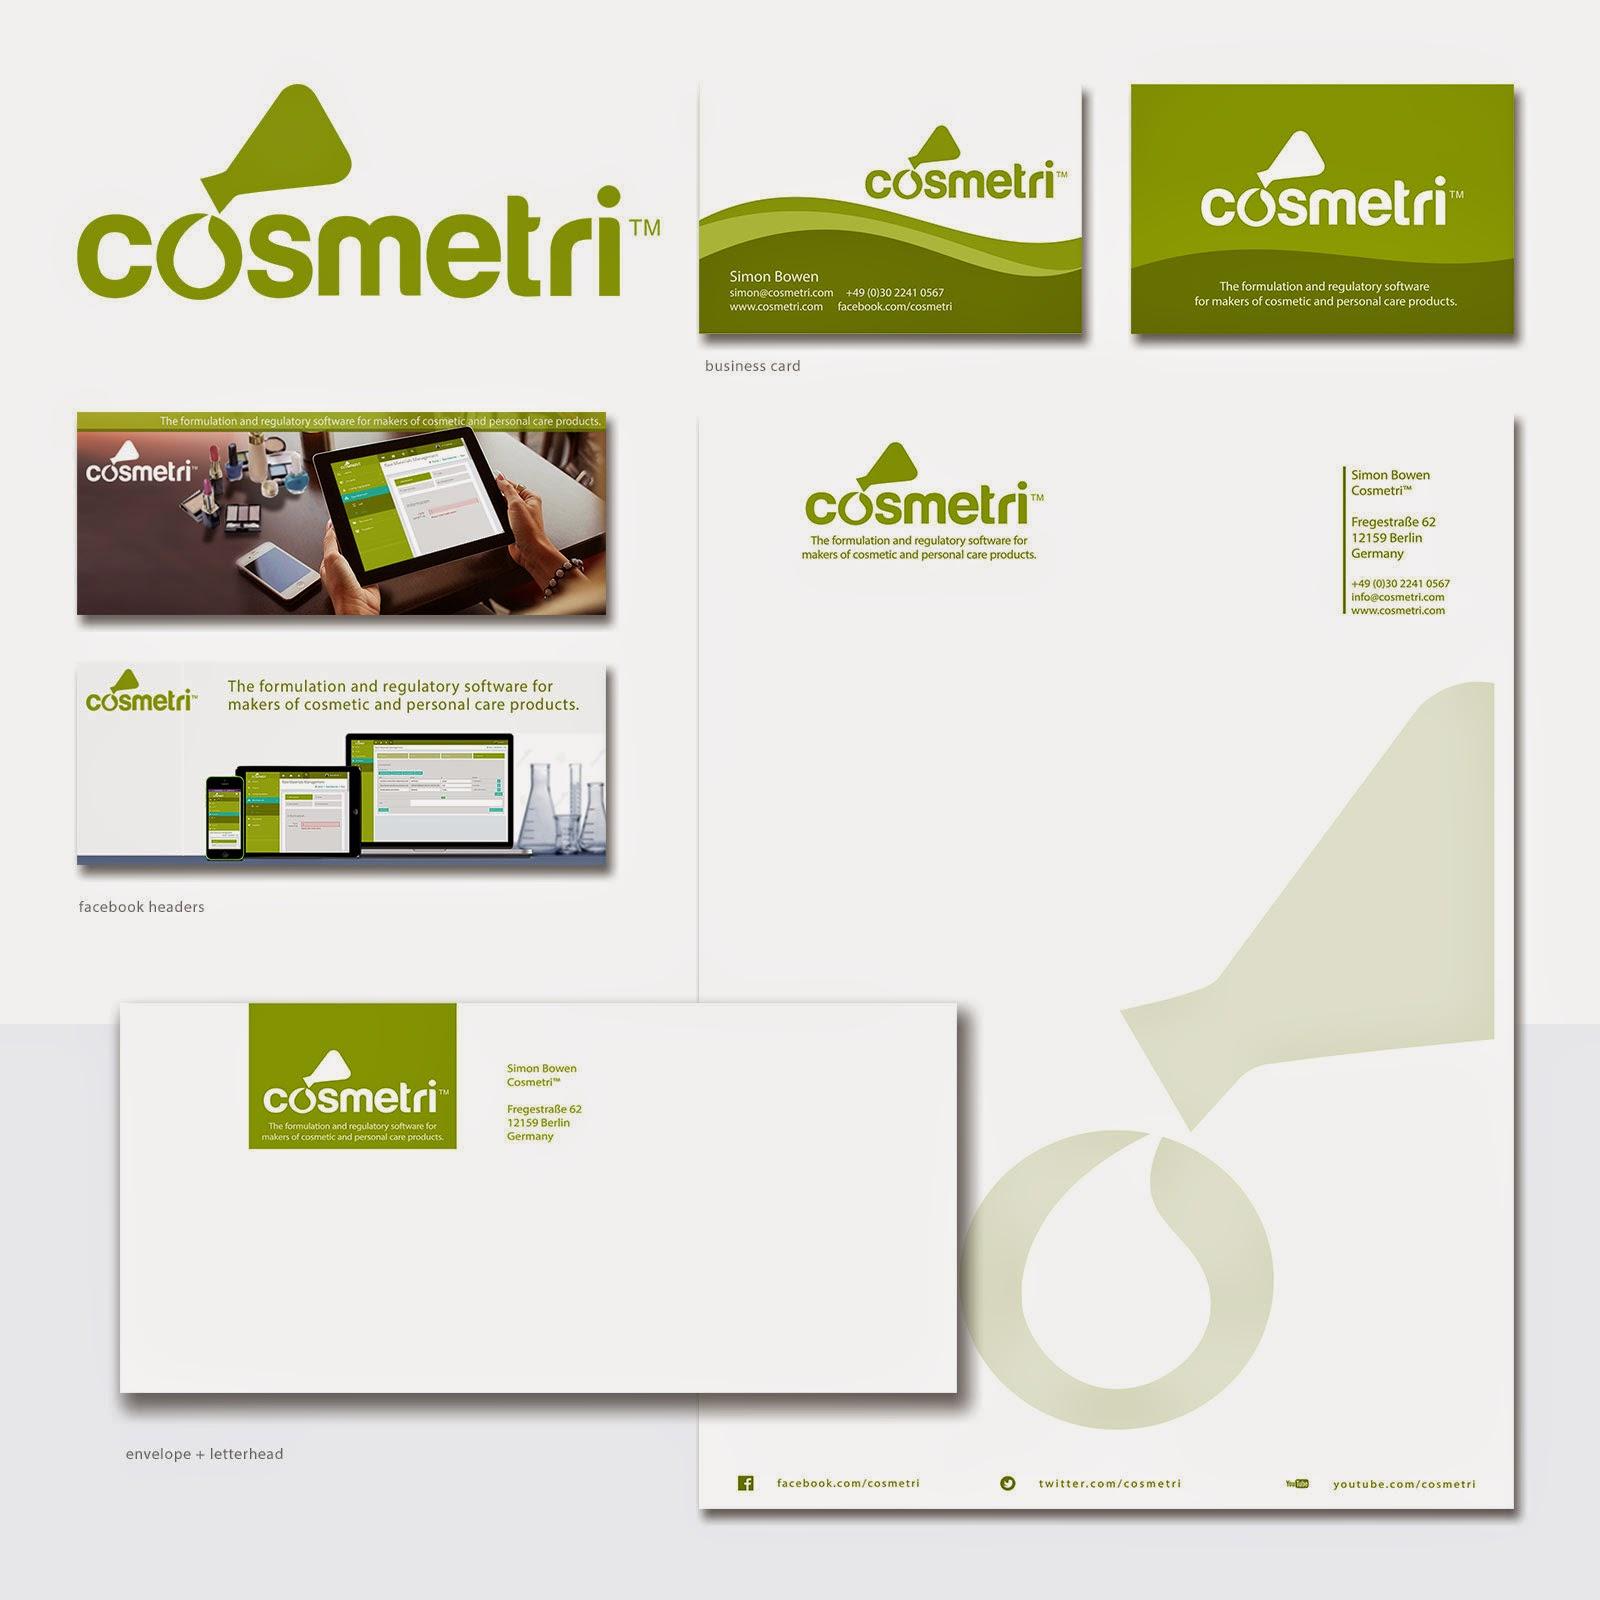 Cosmetri materials